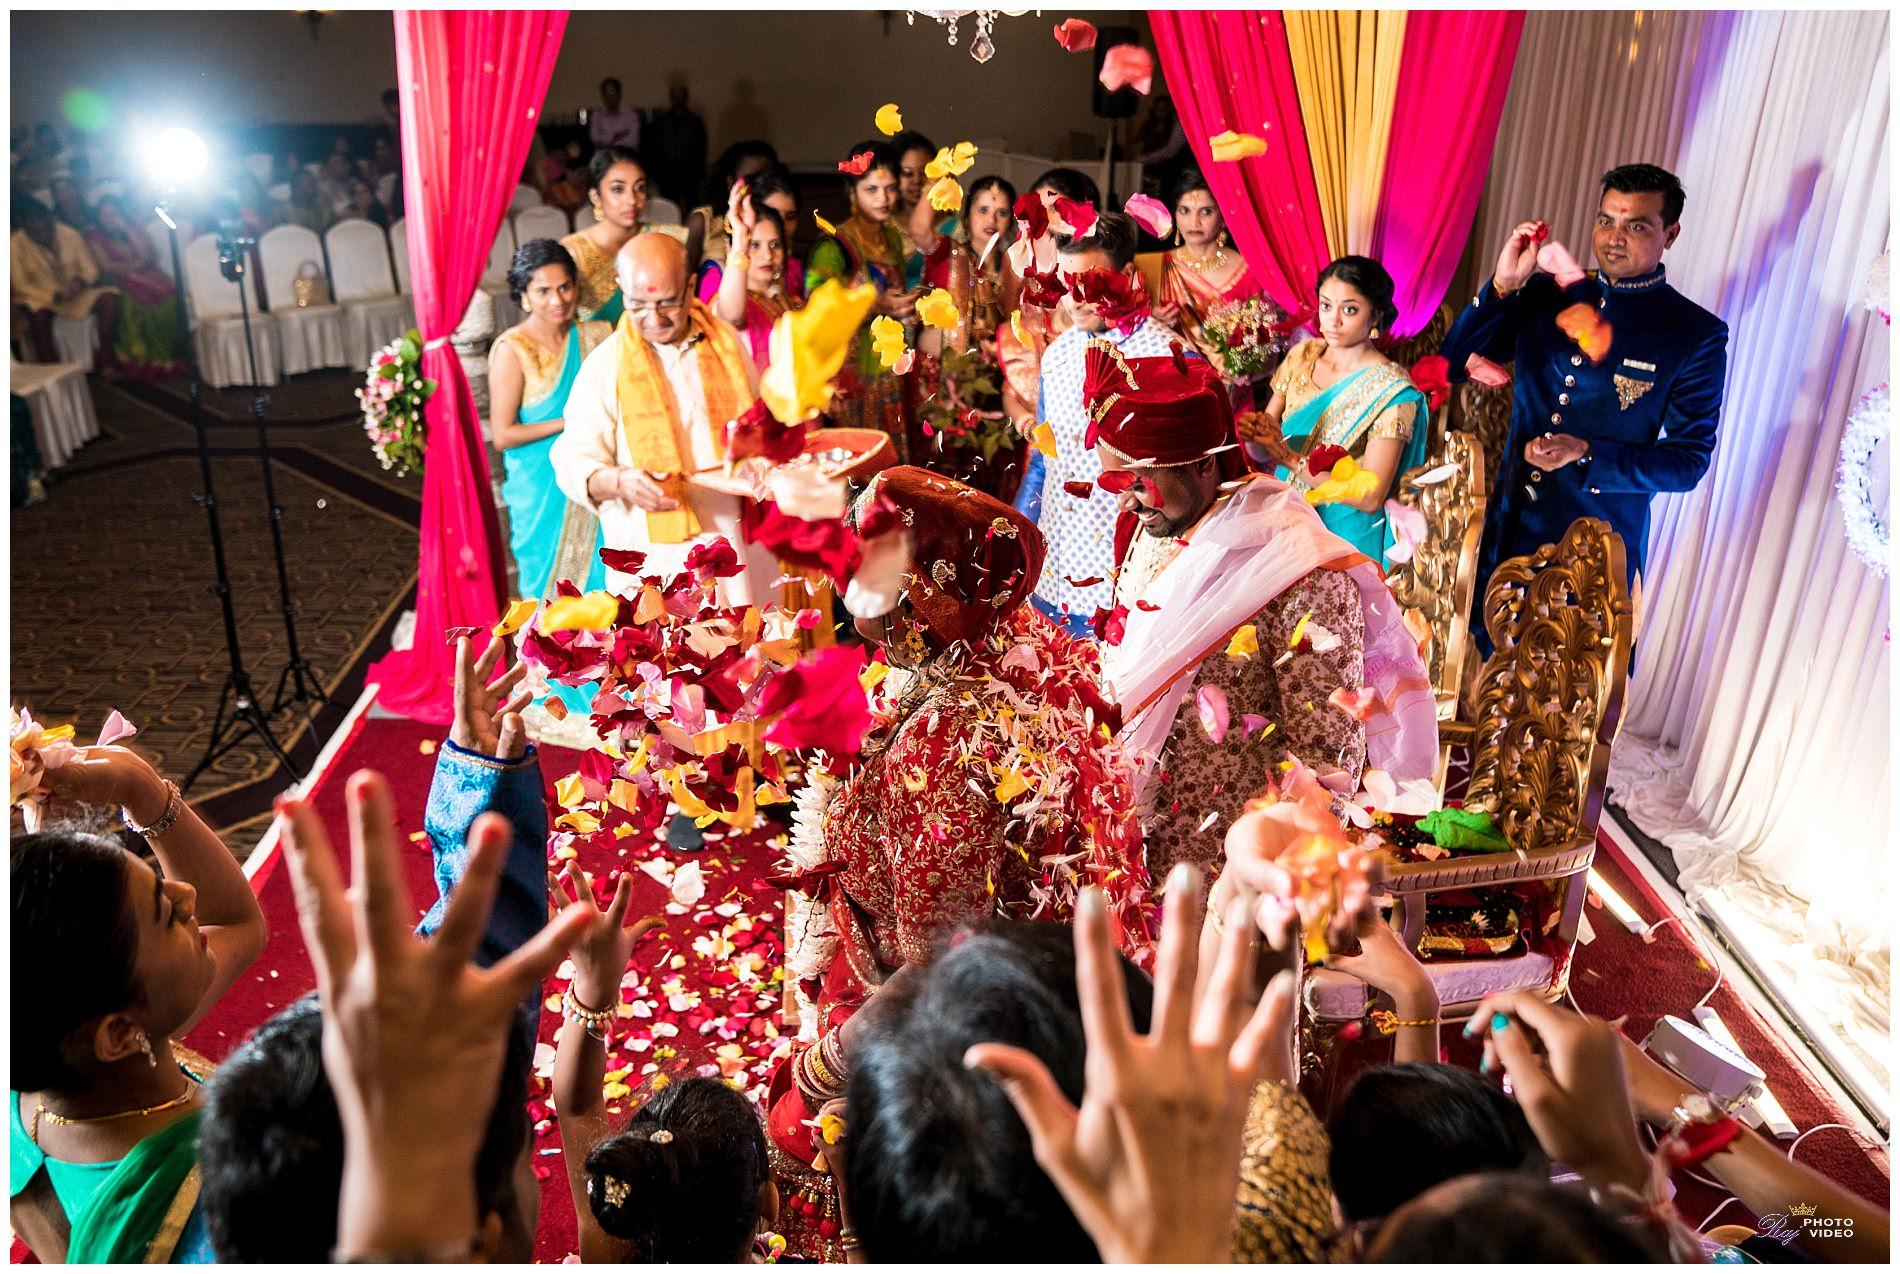 doubletree-by-hilton-hotel-wilmington-de-wedding-krishna-ritesh-64.jpg